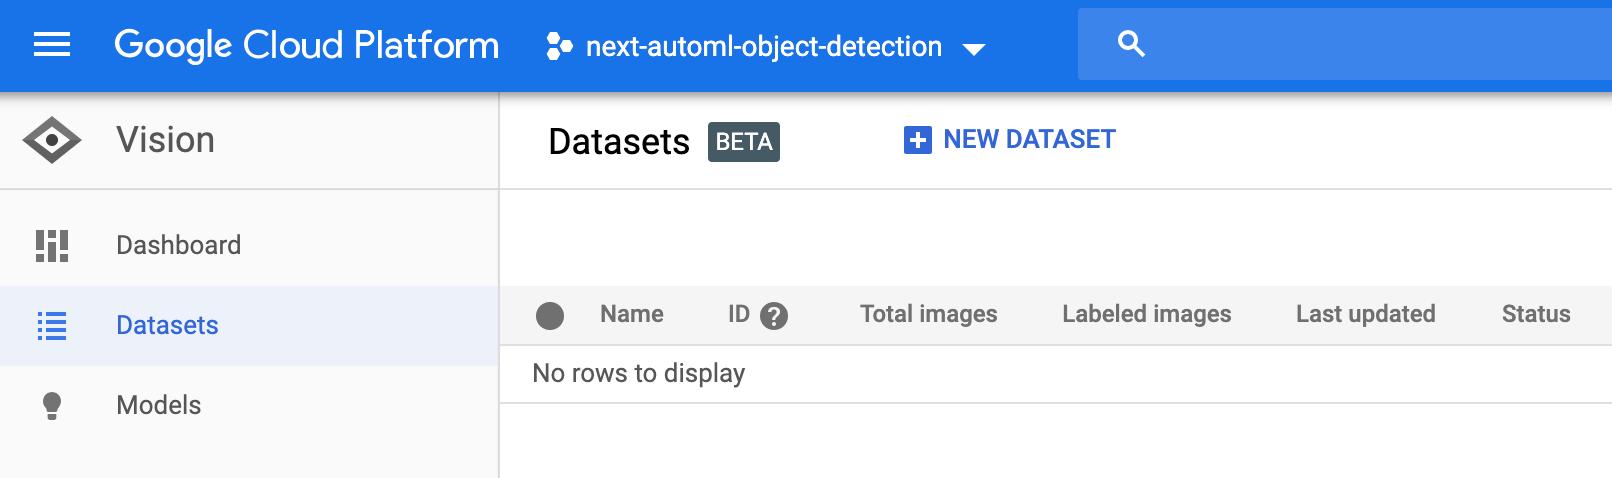 Select create new dataset